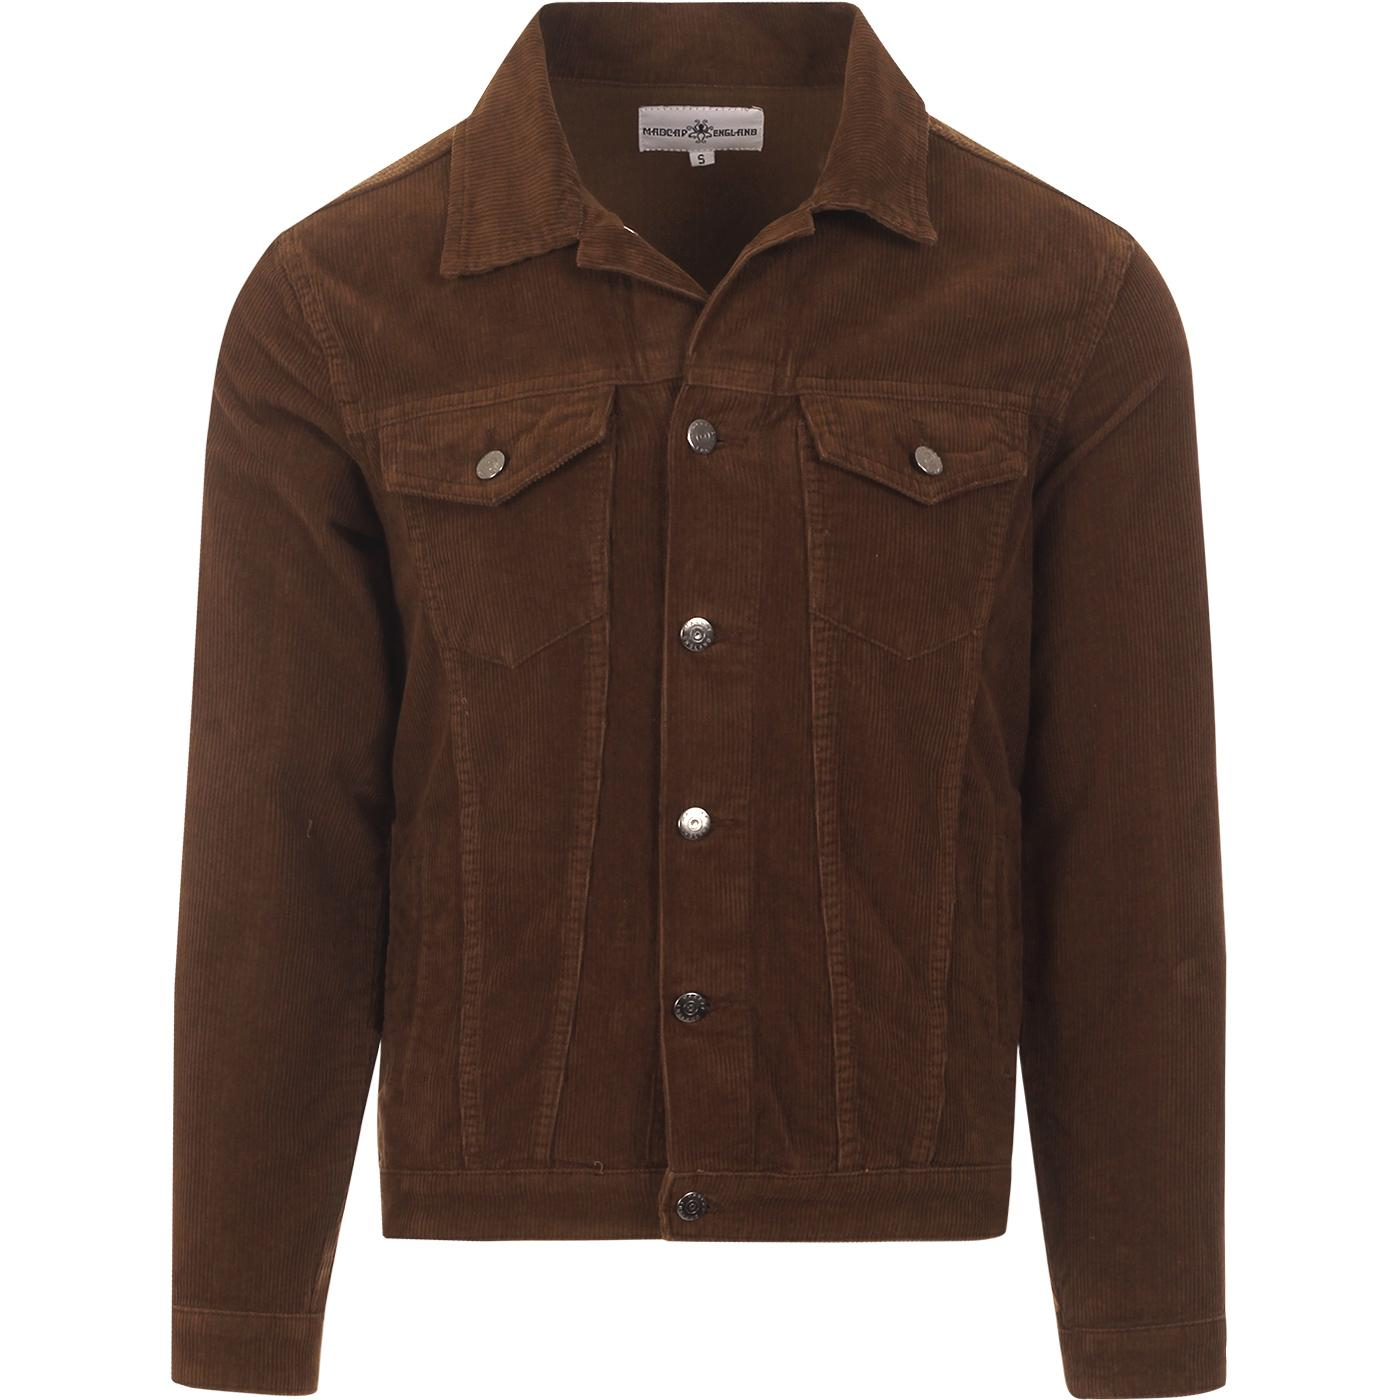 madcap england mens woburn mod cord western jacket choc brown